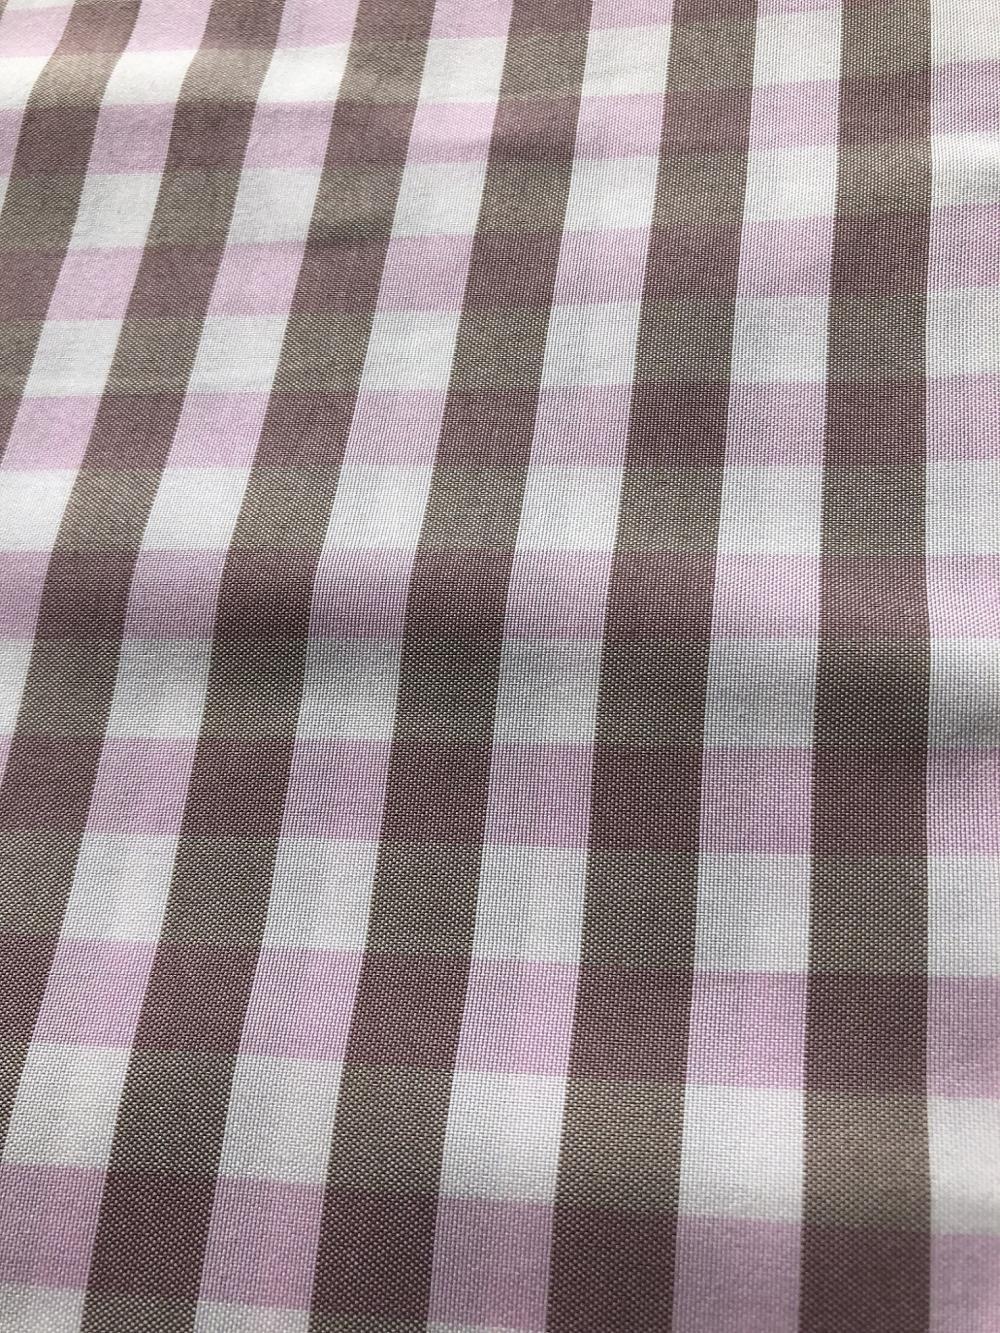 Poyester Bedsheet Twill Fabric